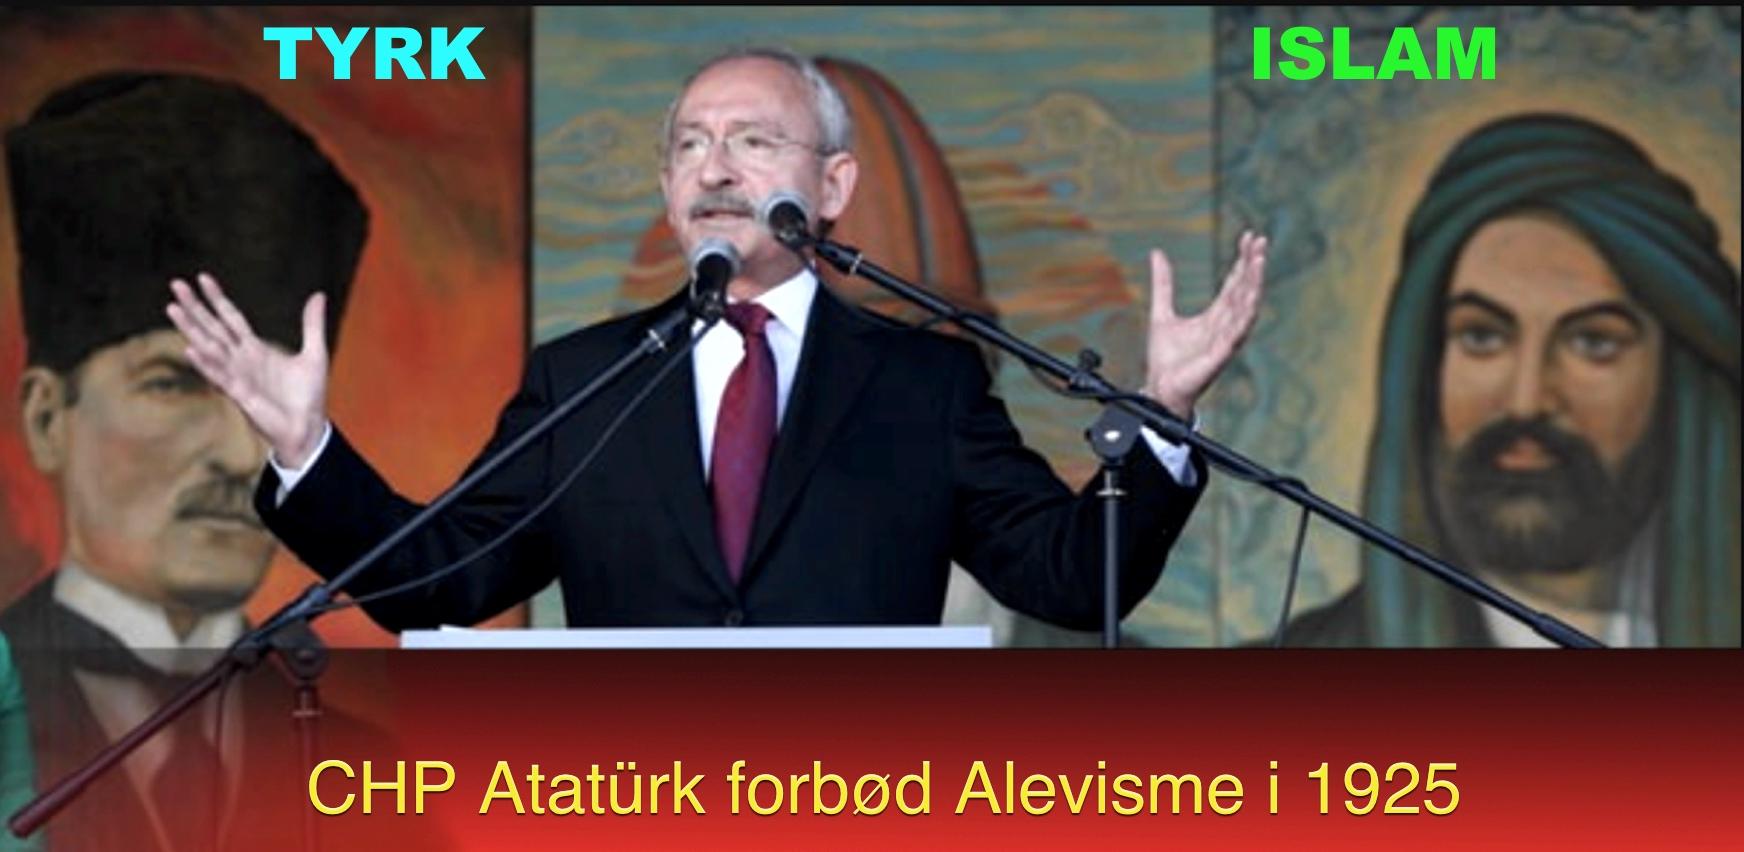 19-Atatürk-tyrk-islamisme-og-alevier-Atatürk-forbudt-alevisme-1925-DAB-Revolutionære-Alevi-Forbund-1